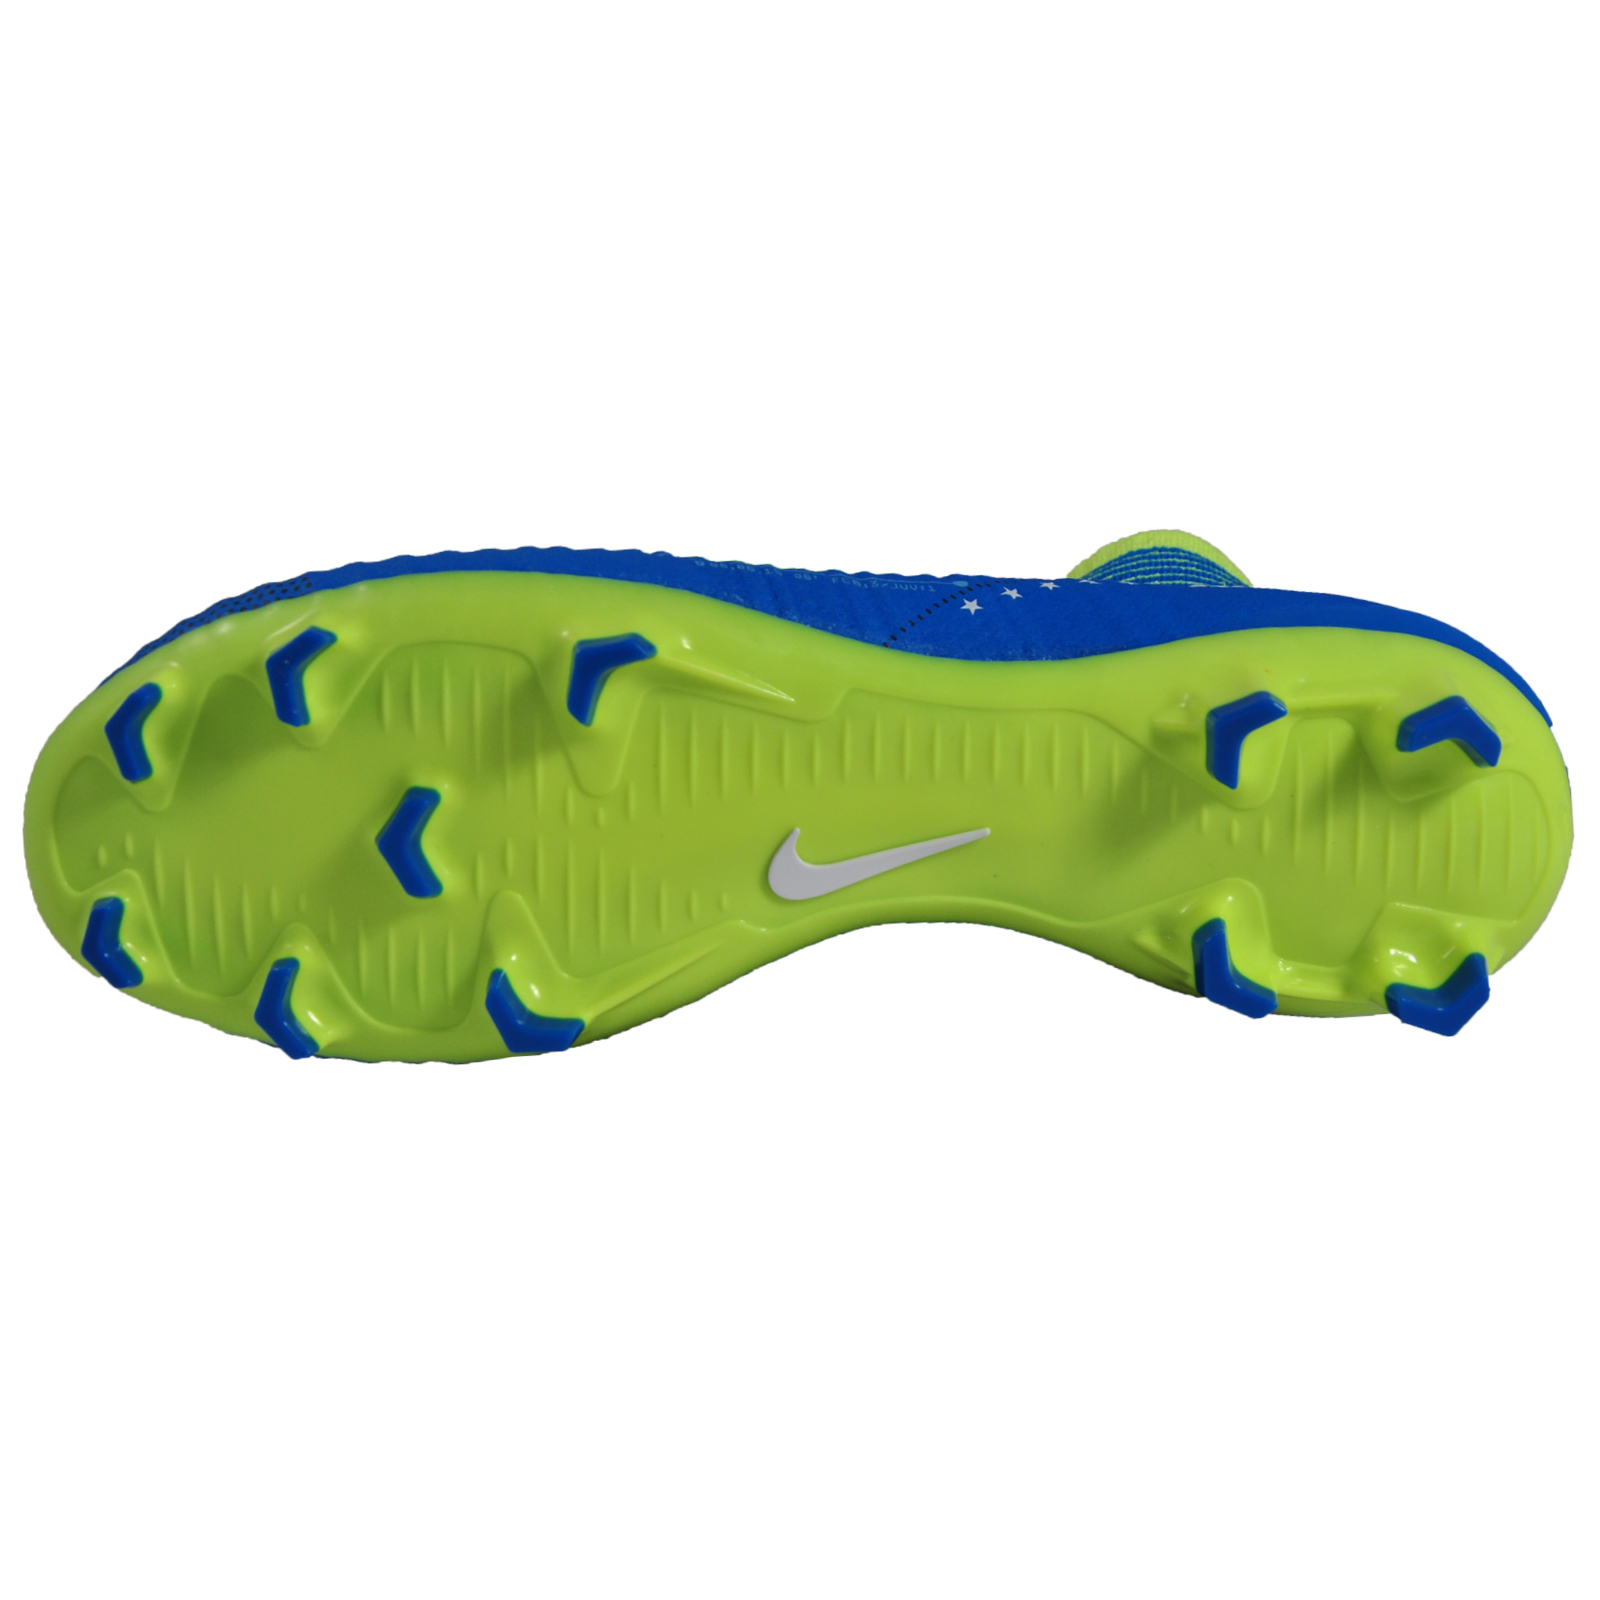 Détails sur Nike Mercurial Superfly de Neymar Fg Junior Pro Football Chaussures de Foot UK 4